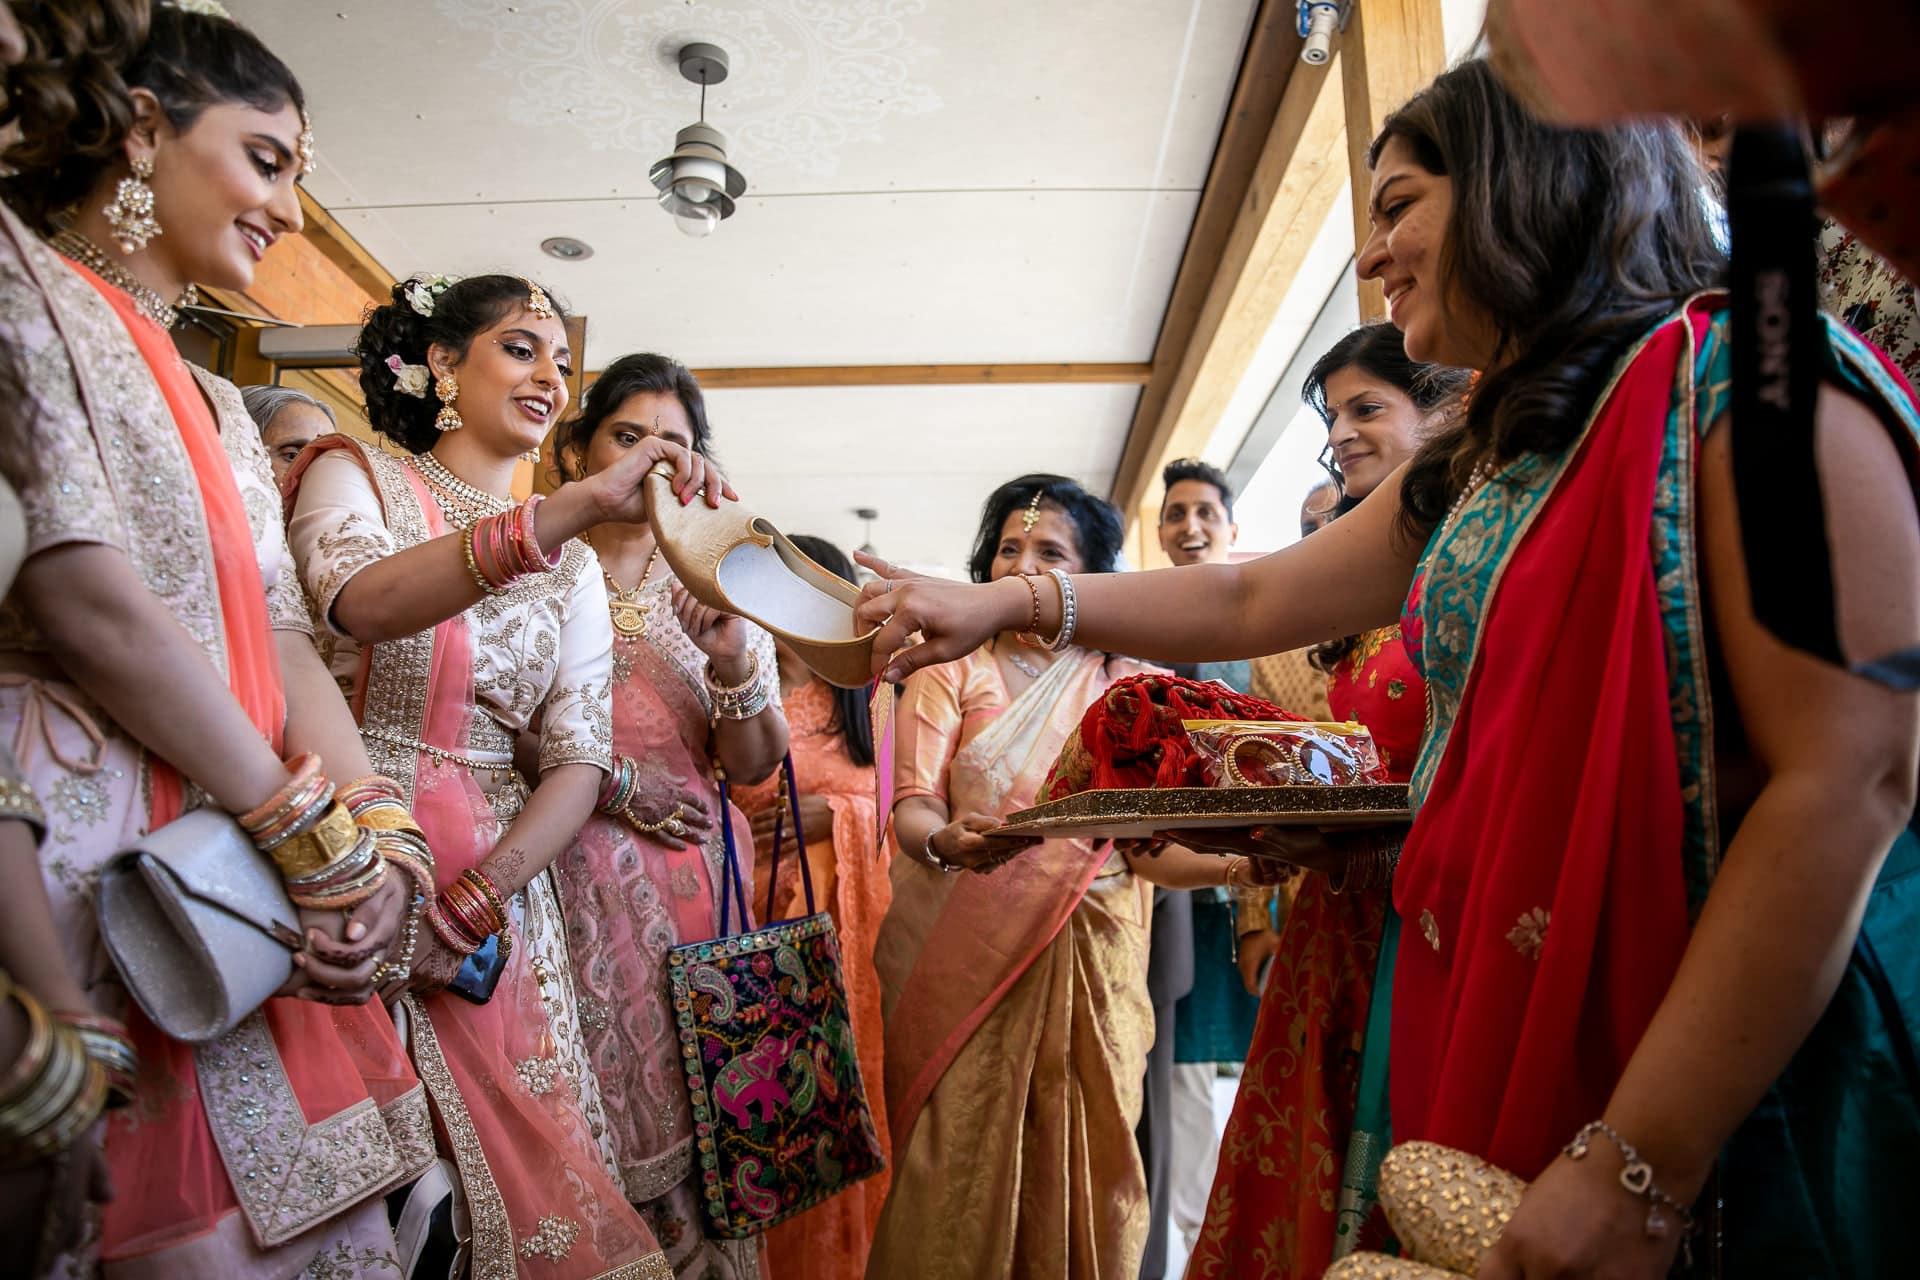 Shoe trading after Hindu wedding